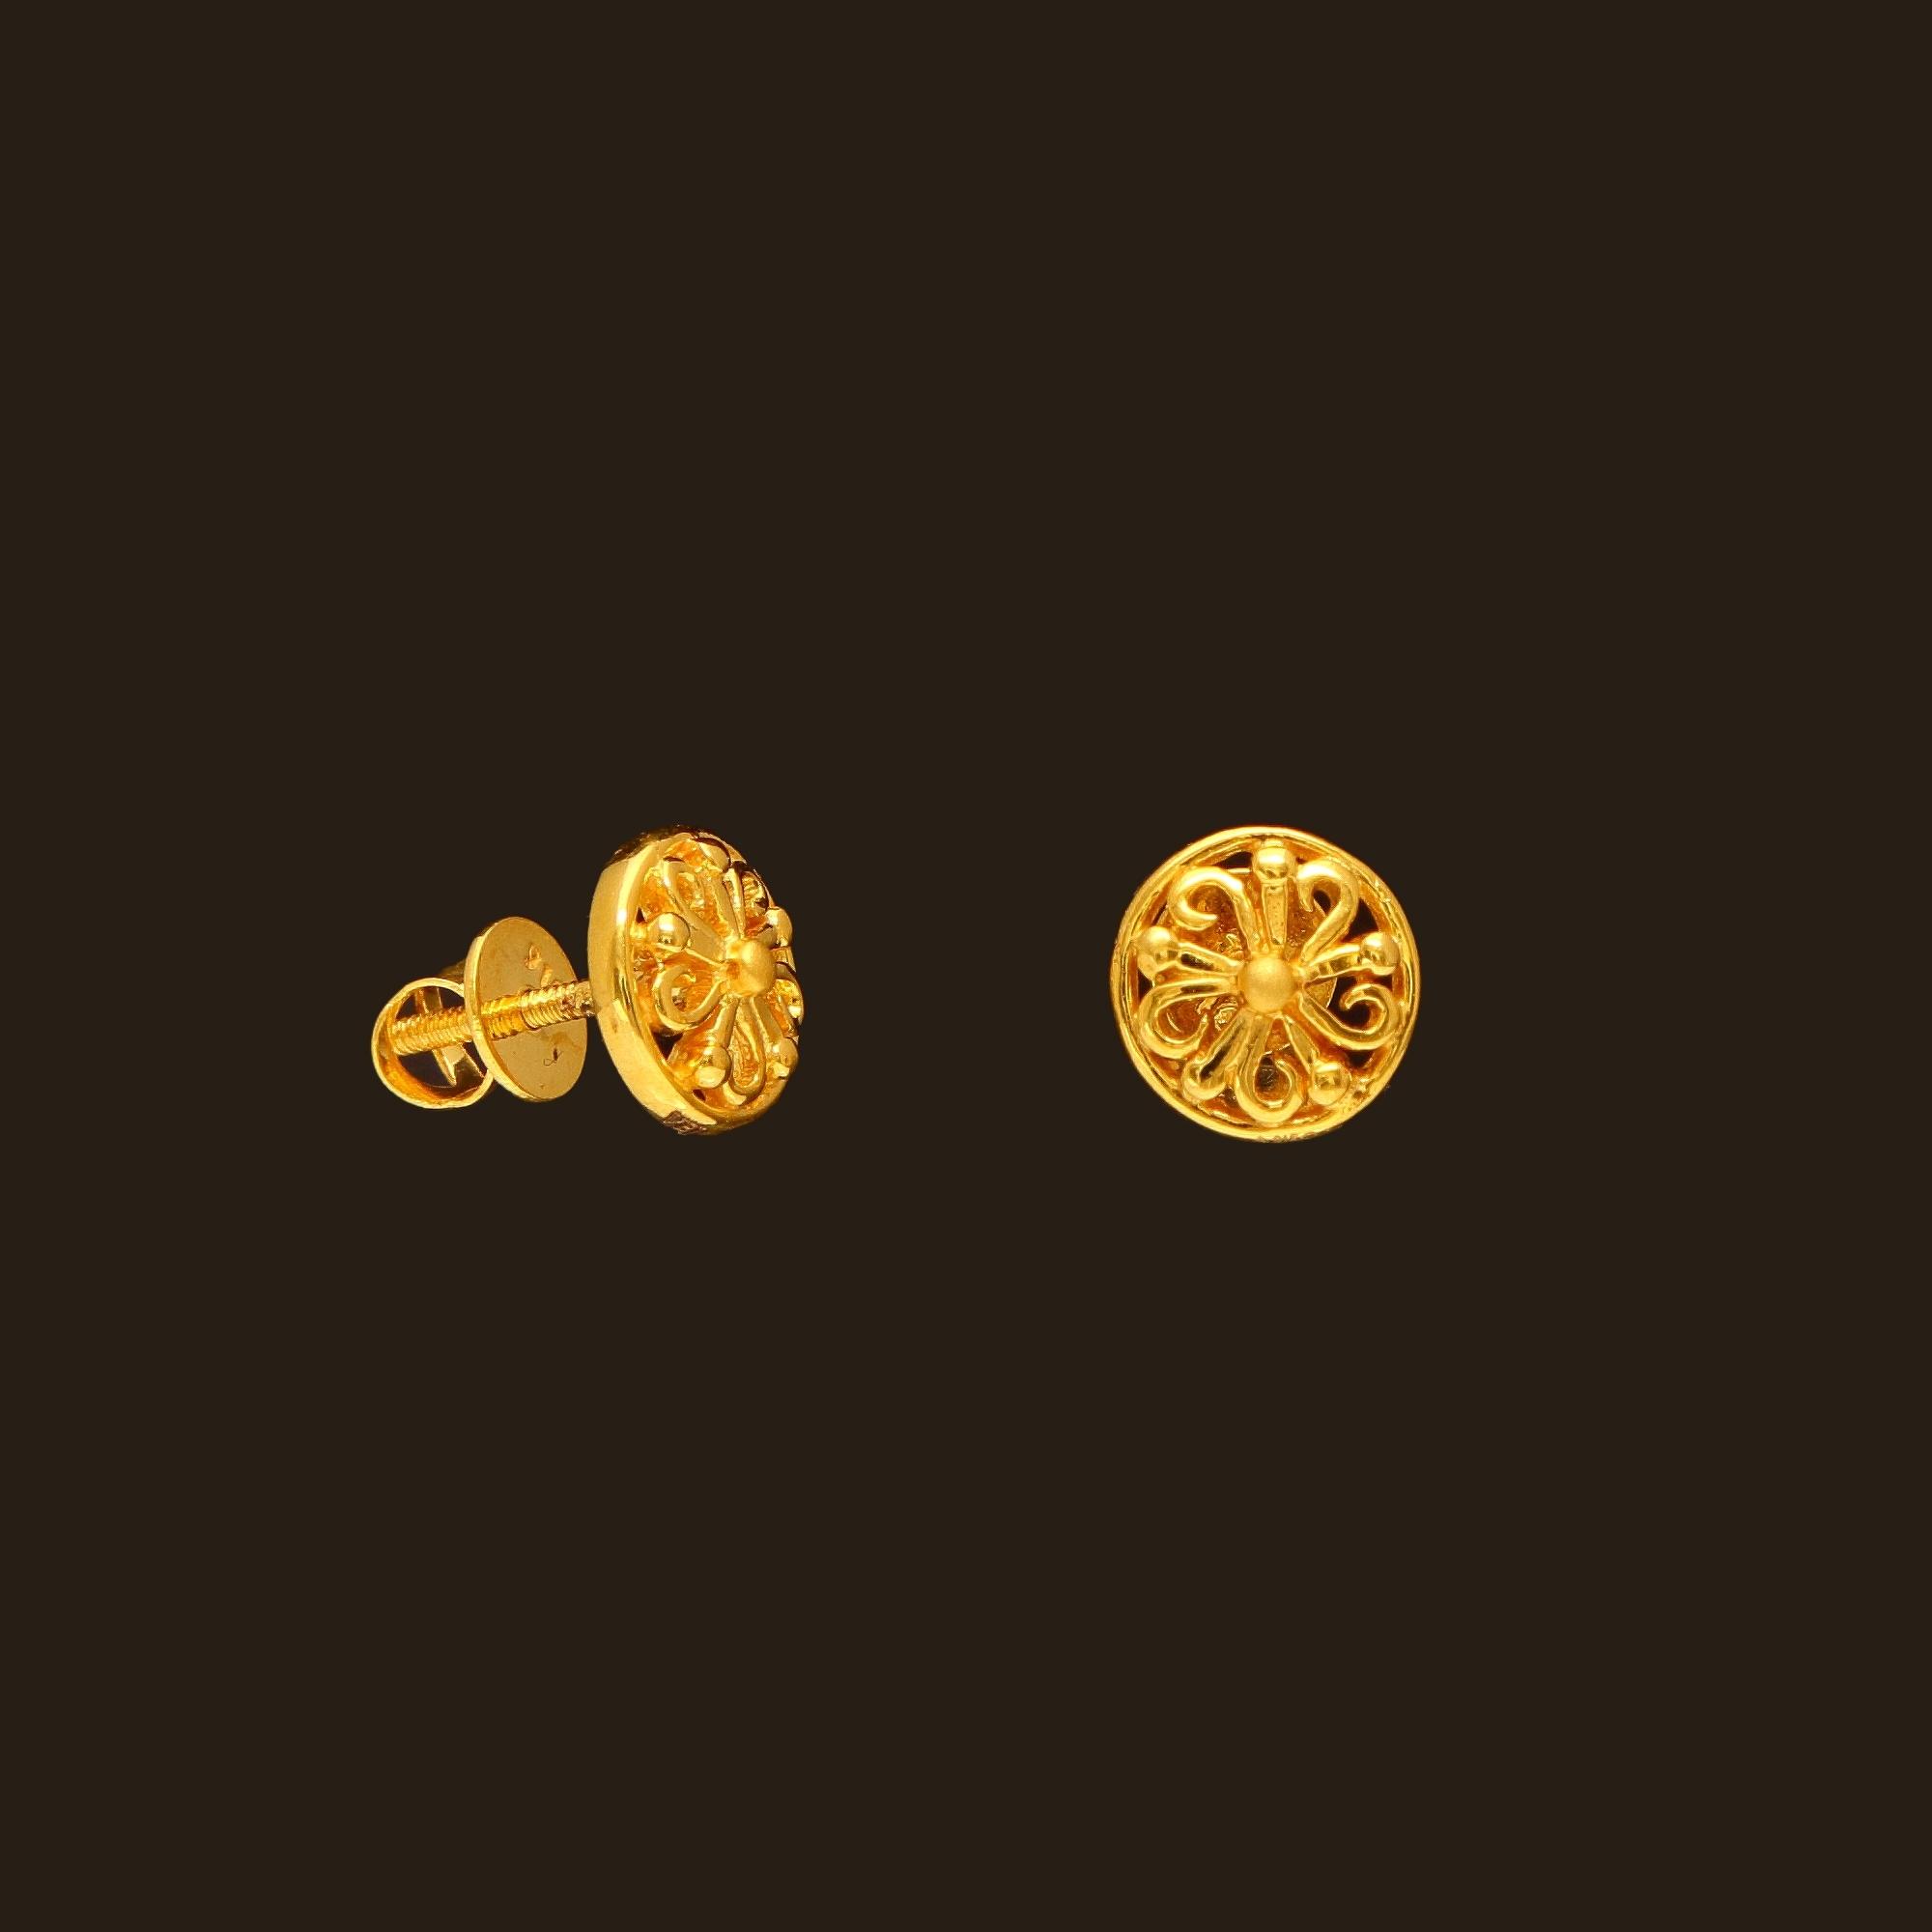 Small Gold Earrings Design